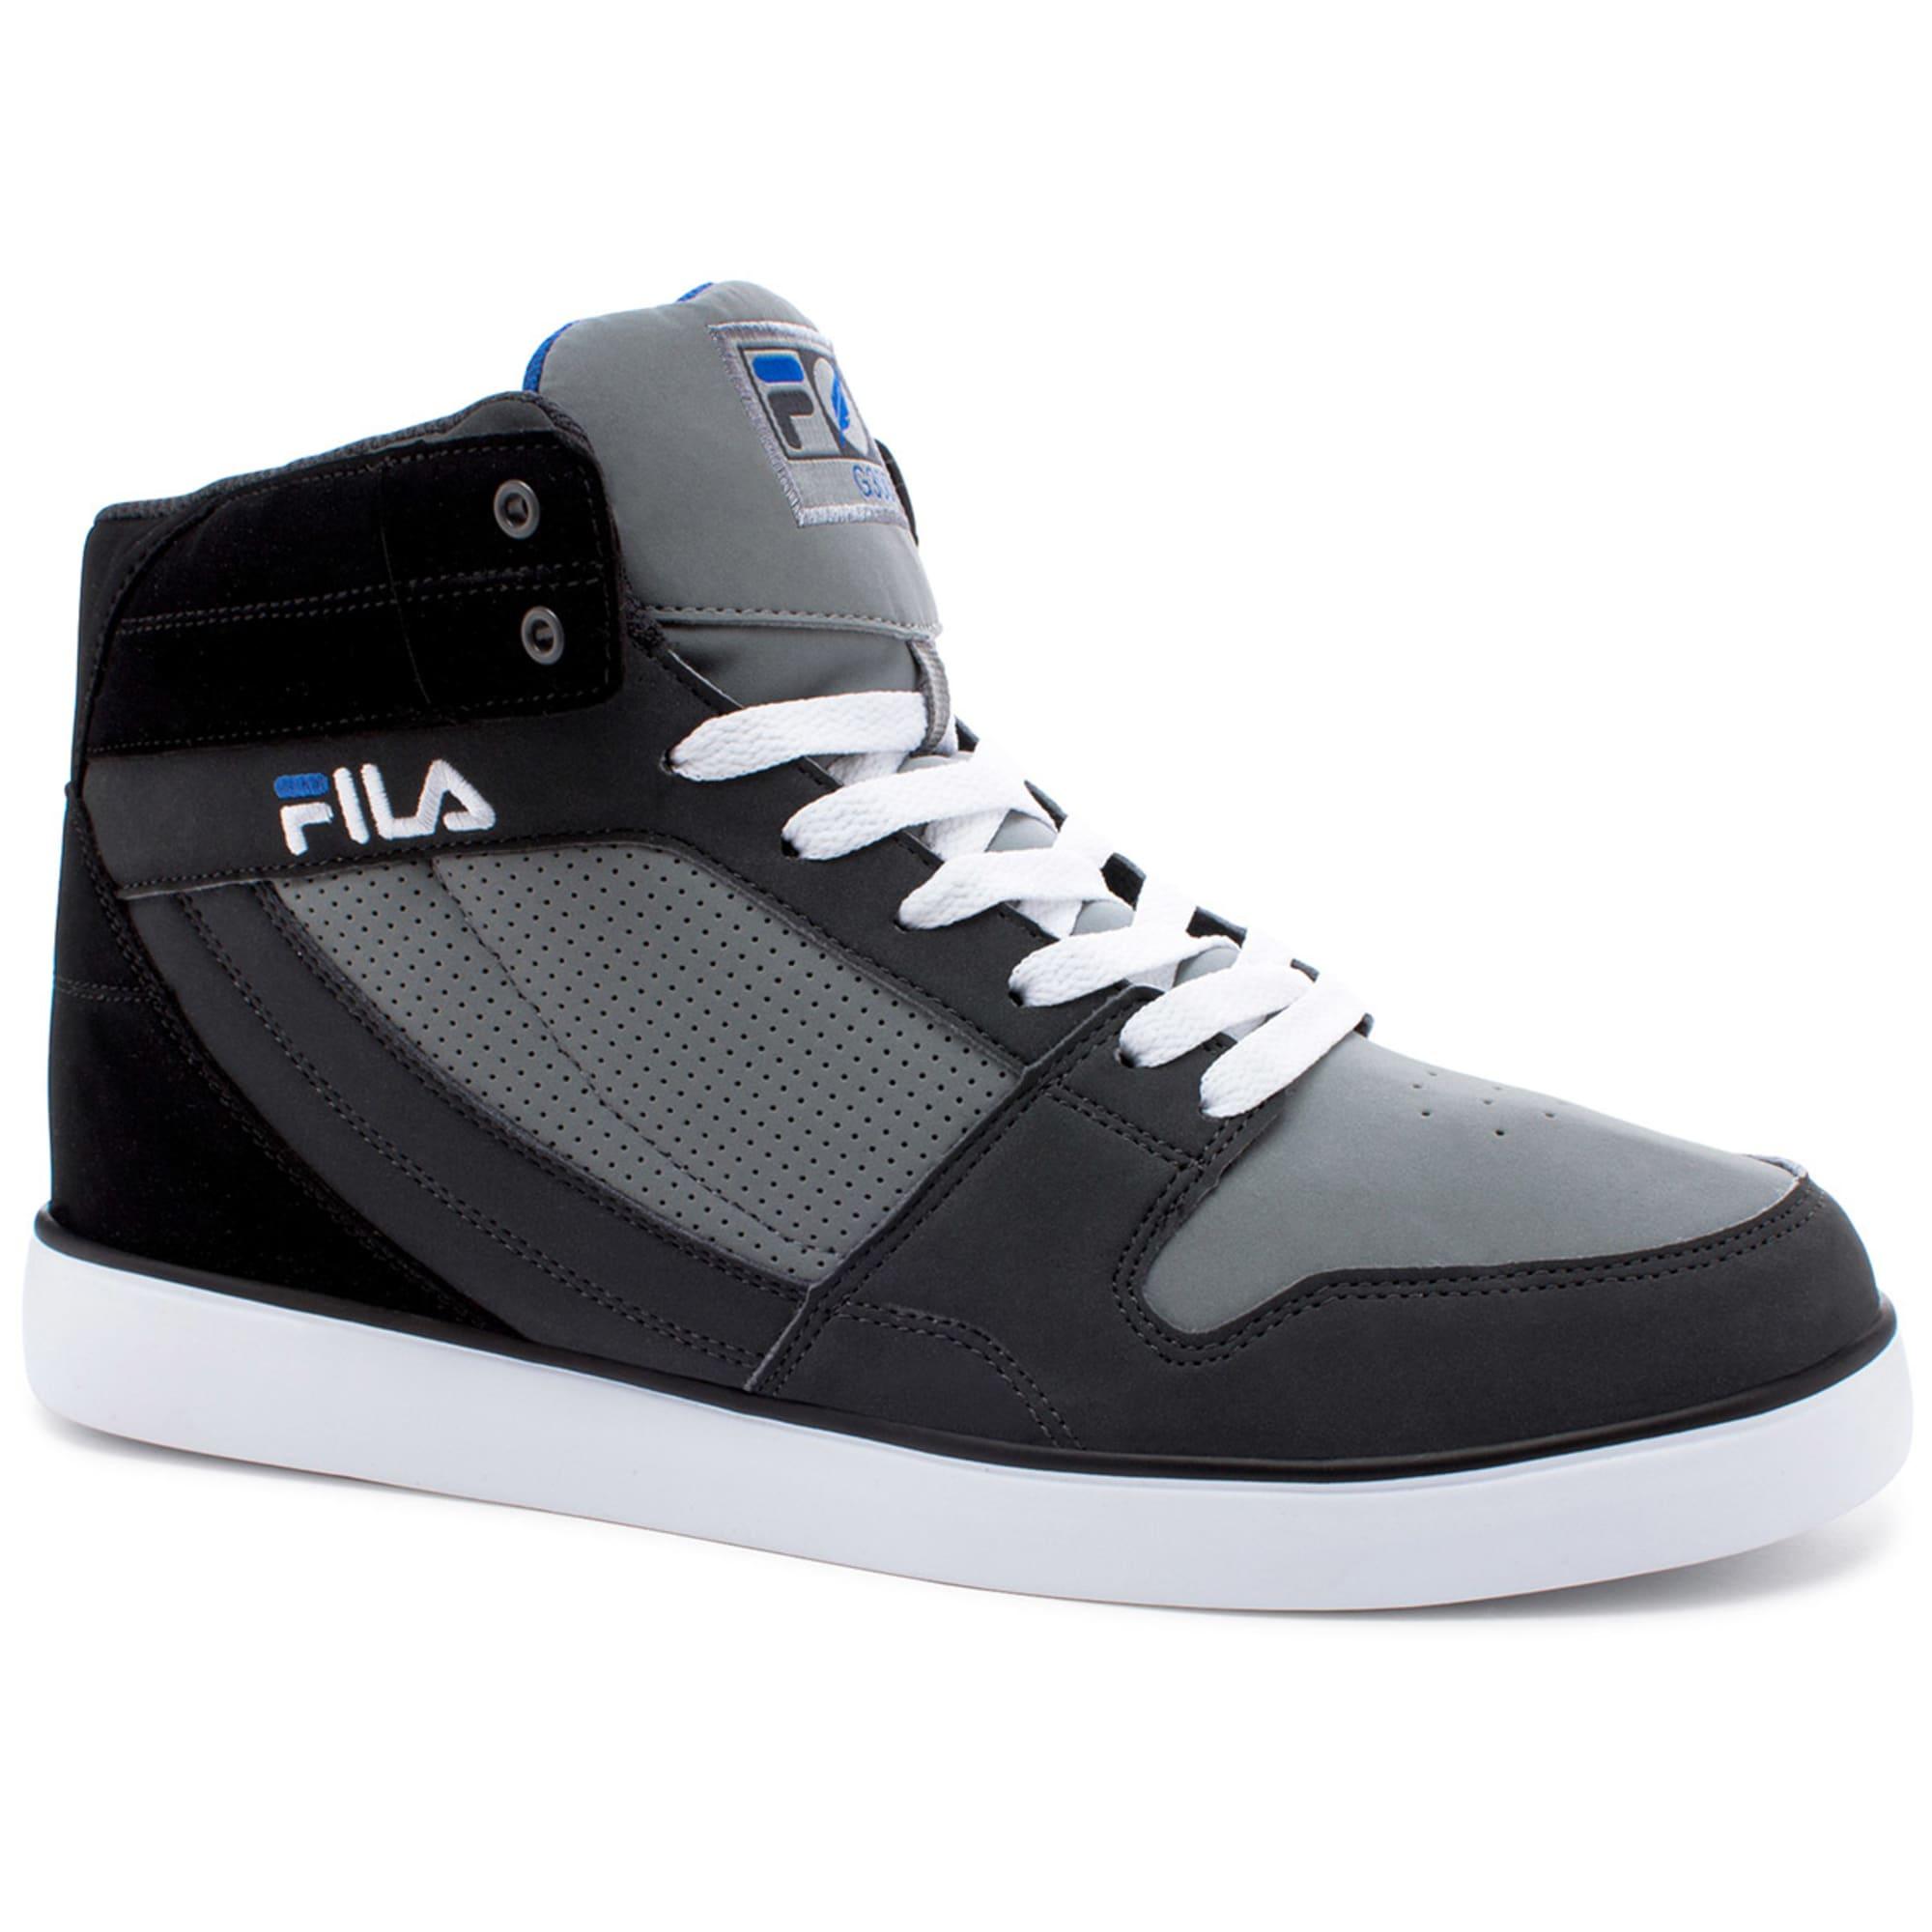 FILA Men's G300 Figueroa Shoes Bob's Stores